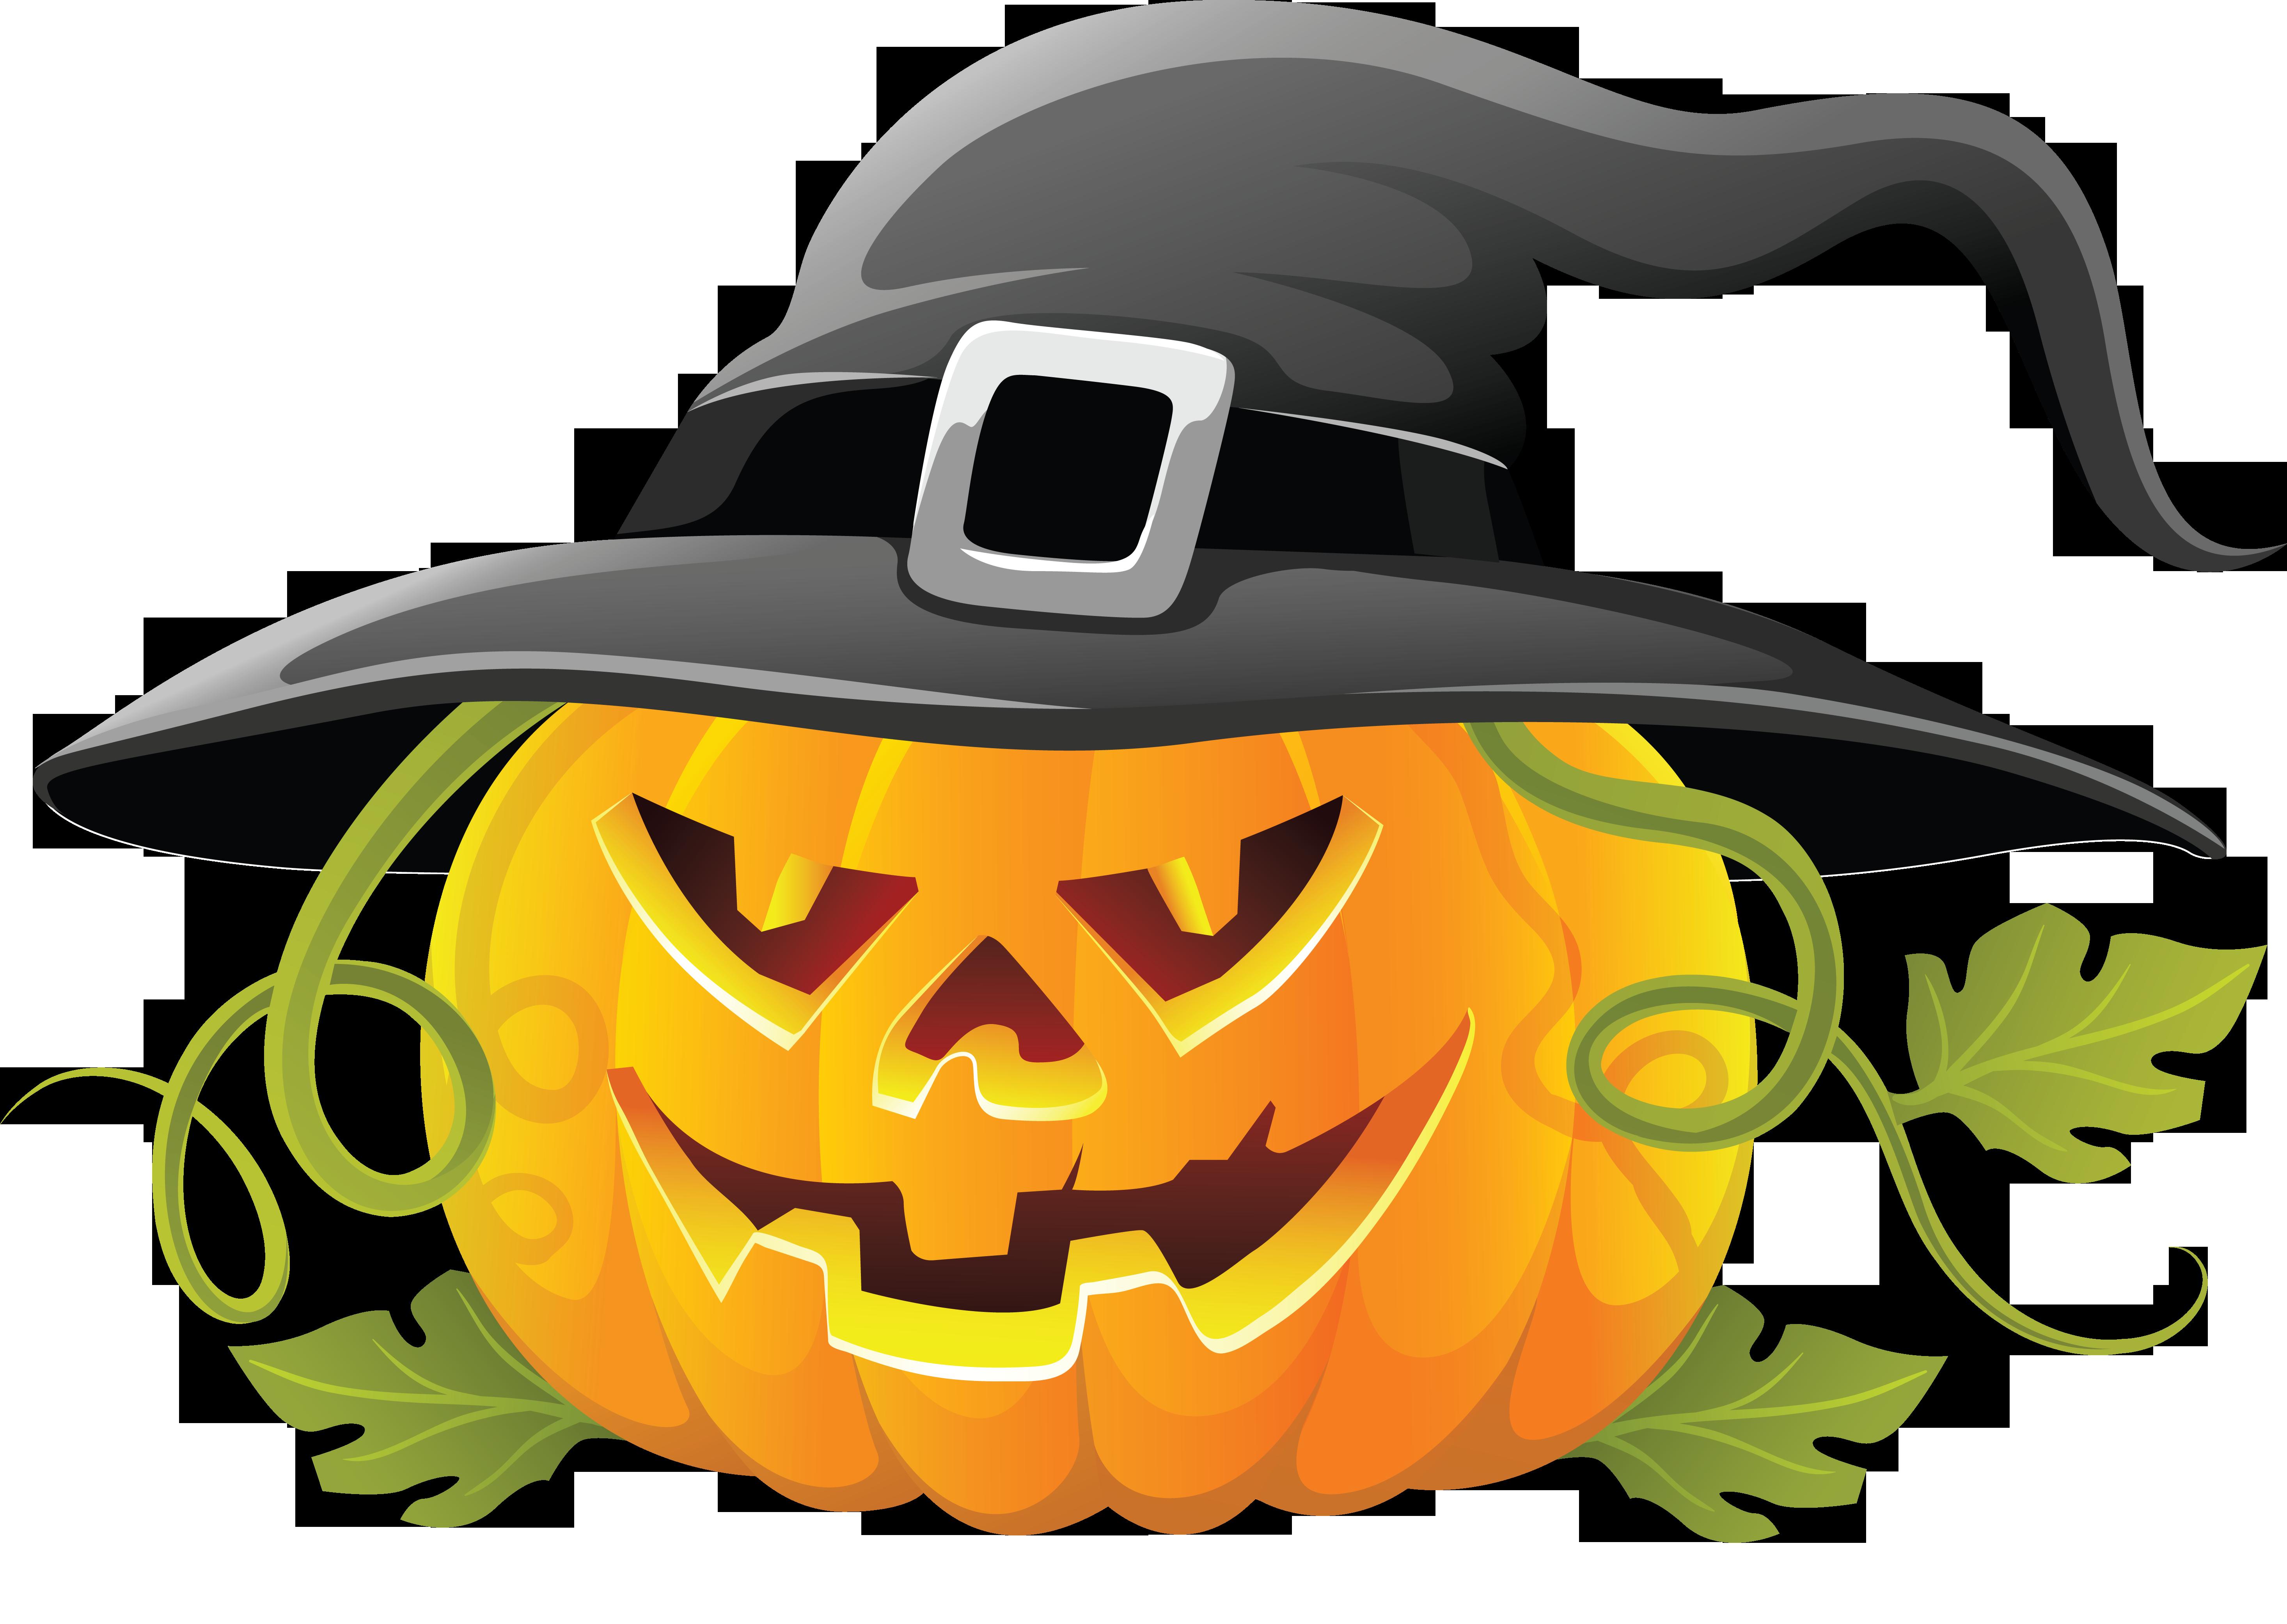 Halloween Pumpkin Clipart .-Halloween Pumpkin Clipart .-13